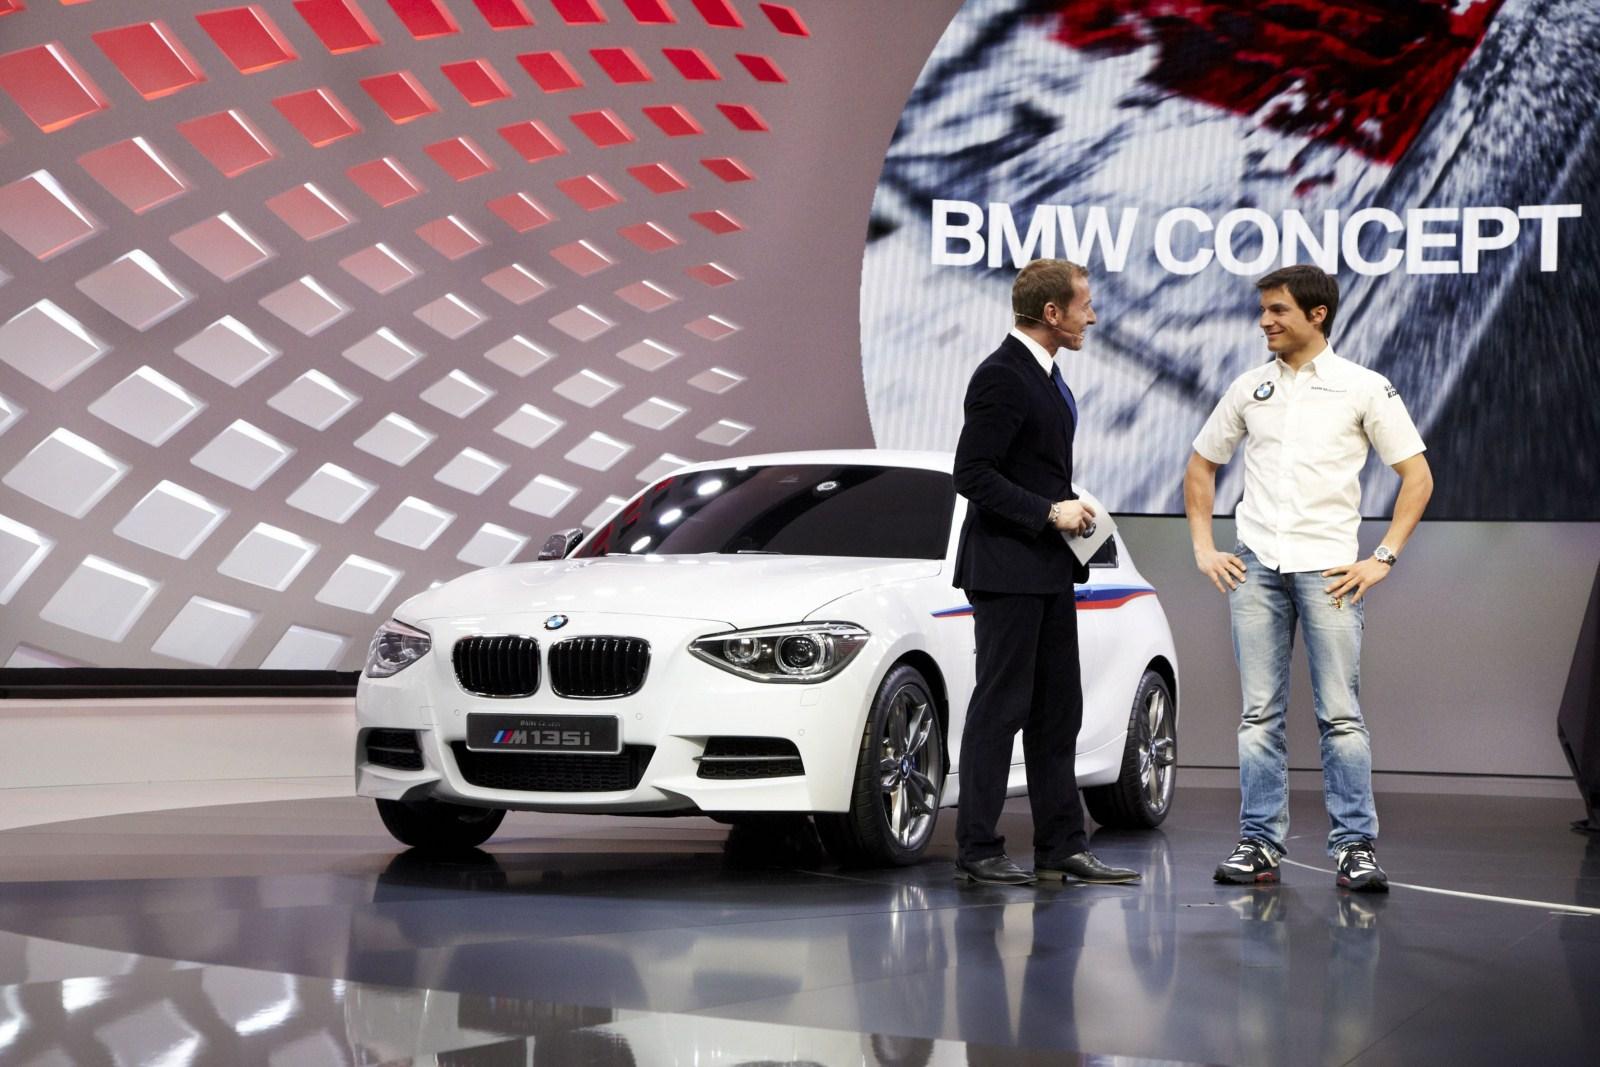 2008 BMW M135i Concept - Car Pictures